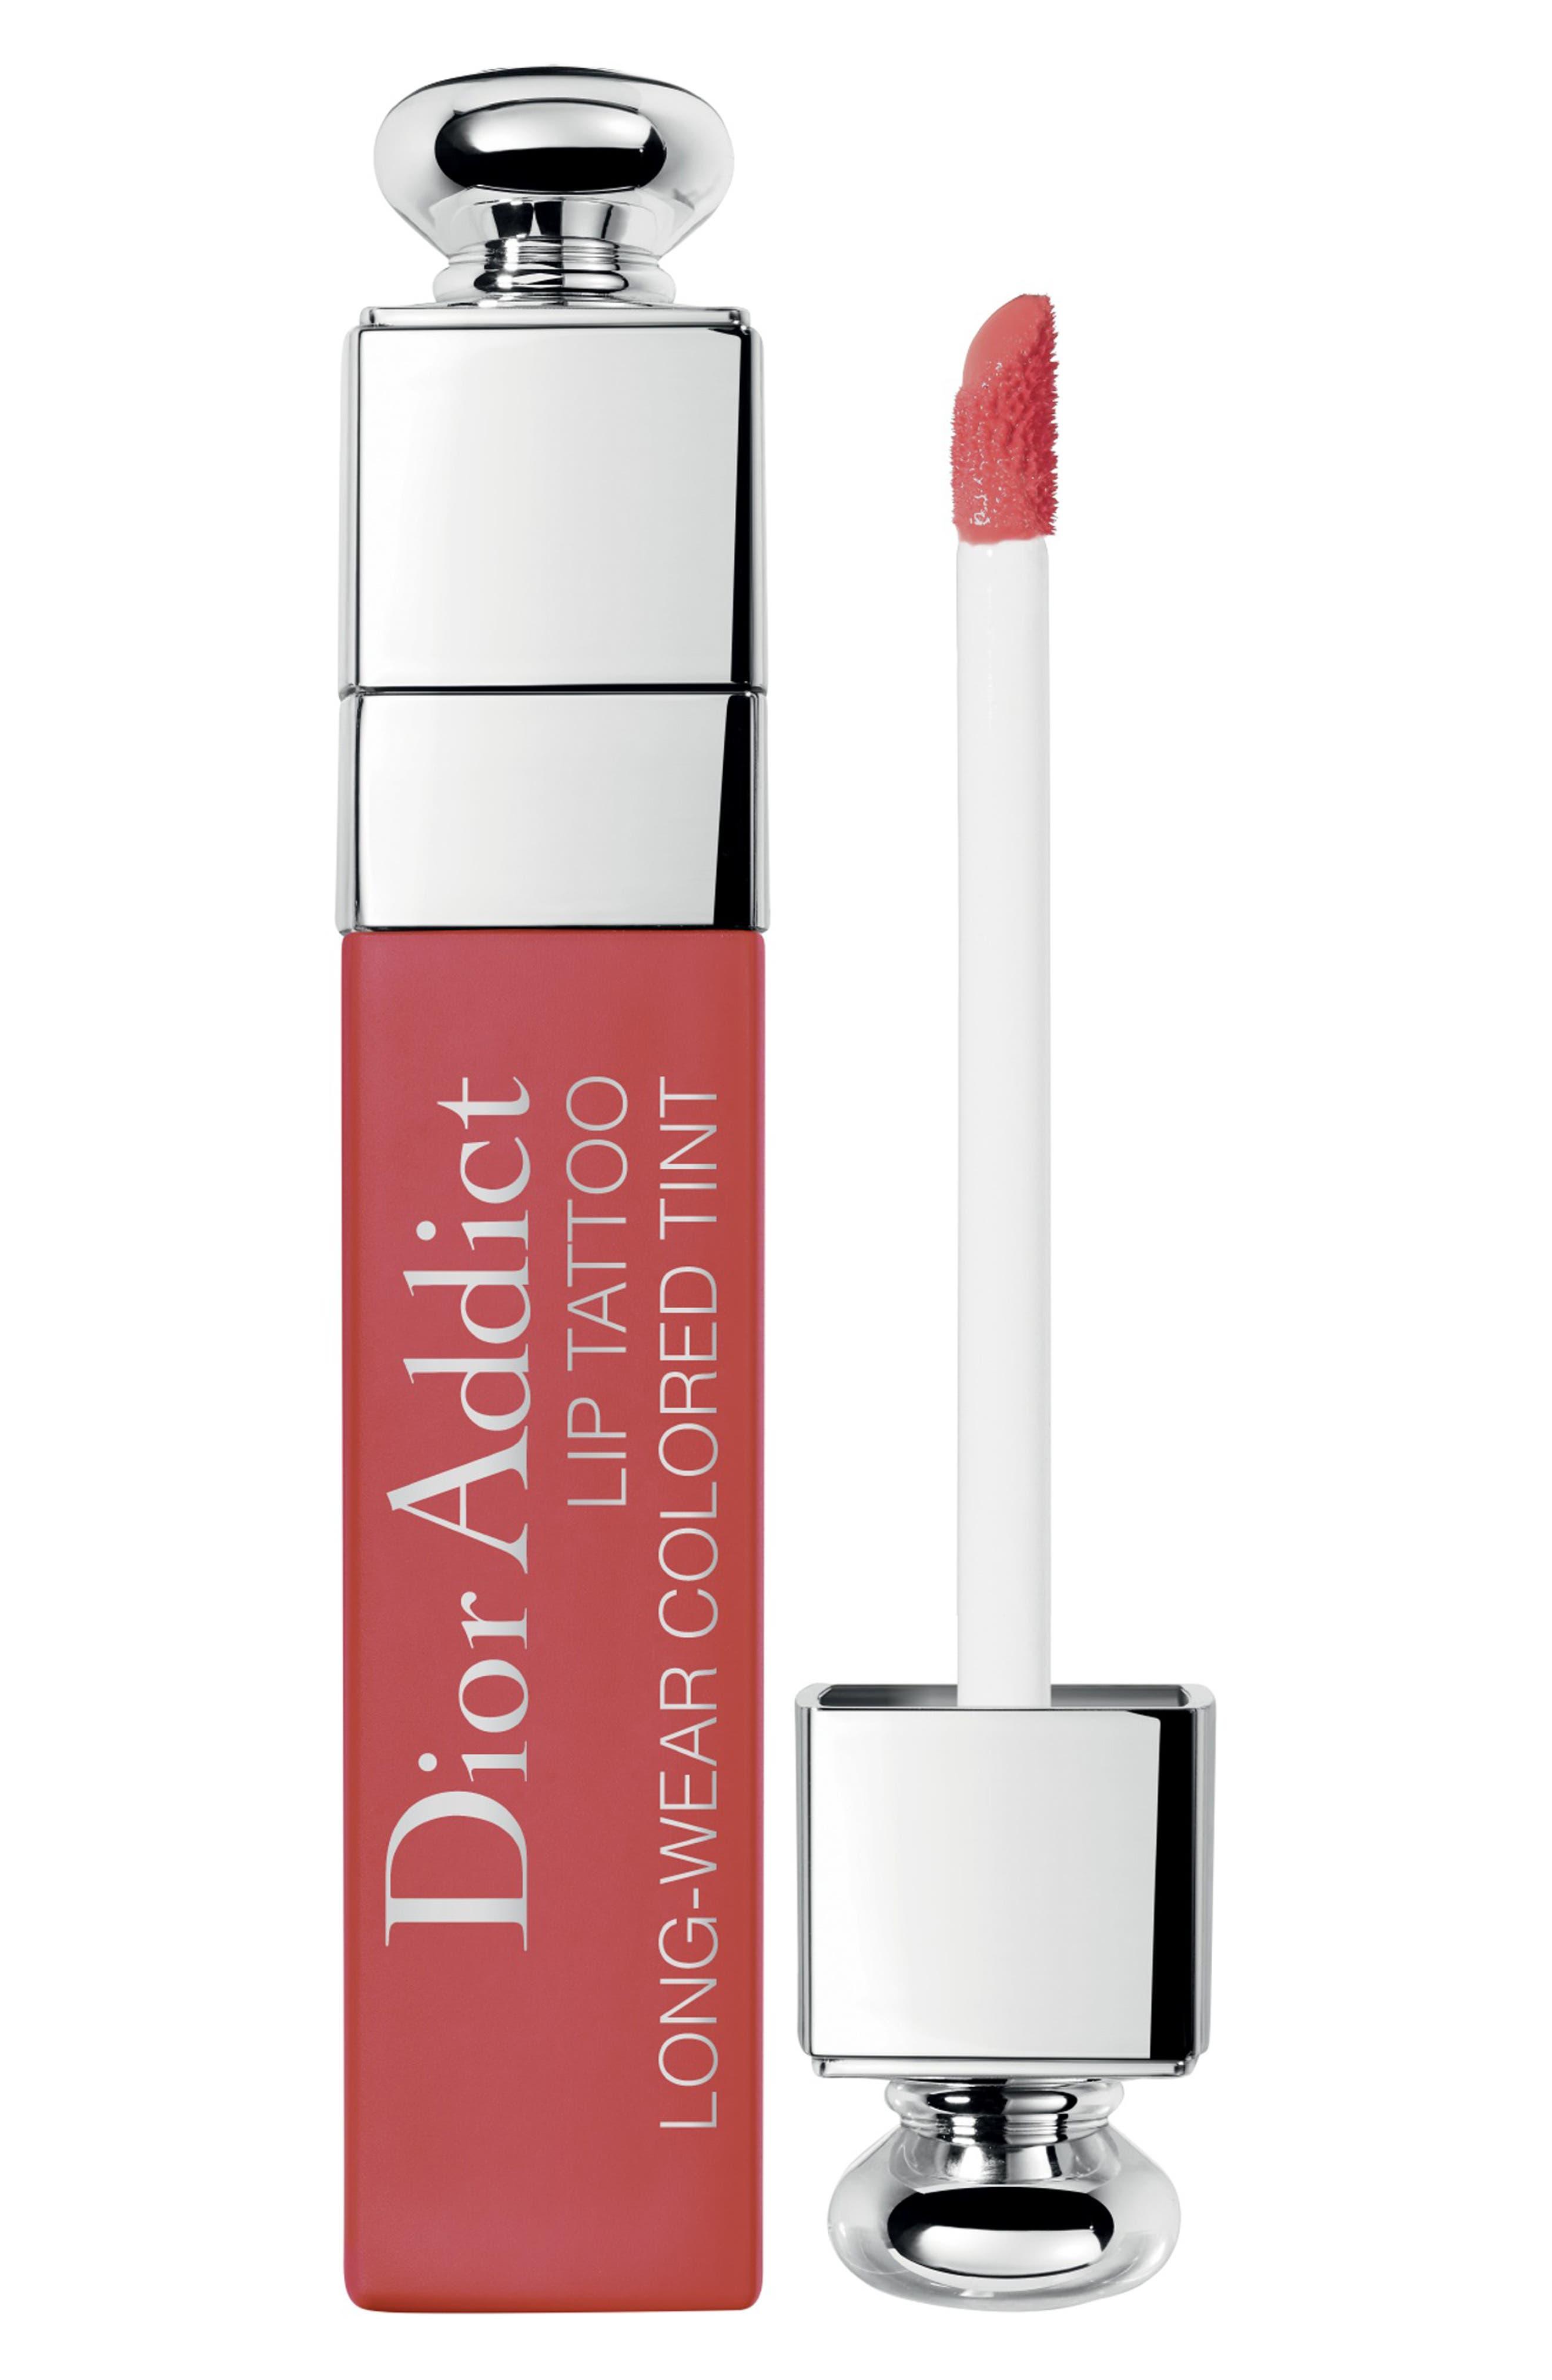 Dior Addict Lip Tattoo Long-Wearing Color Tint - 541 Natural Sienna